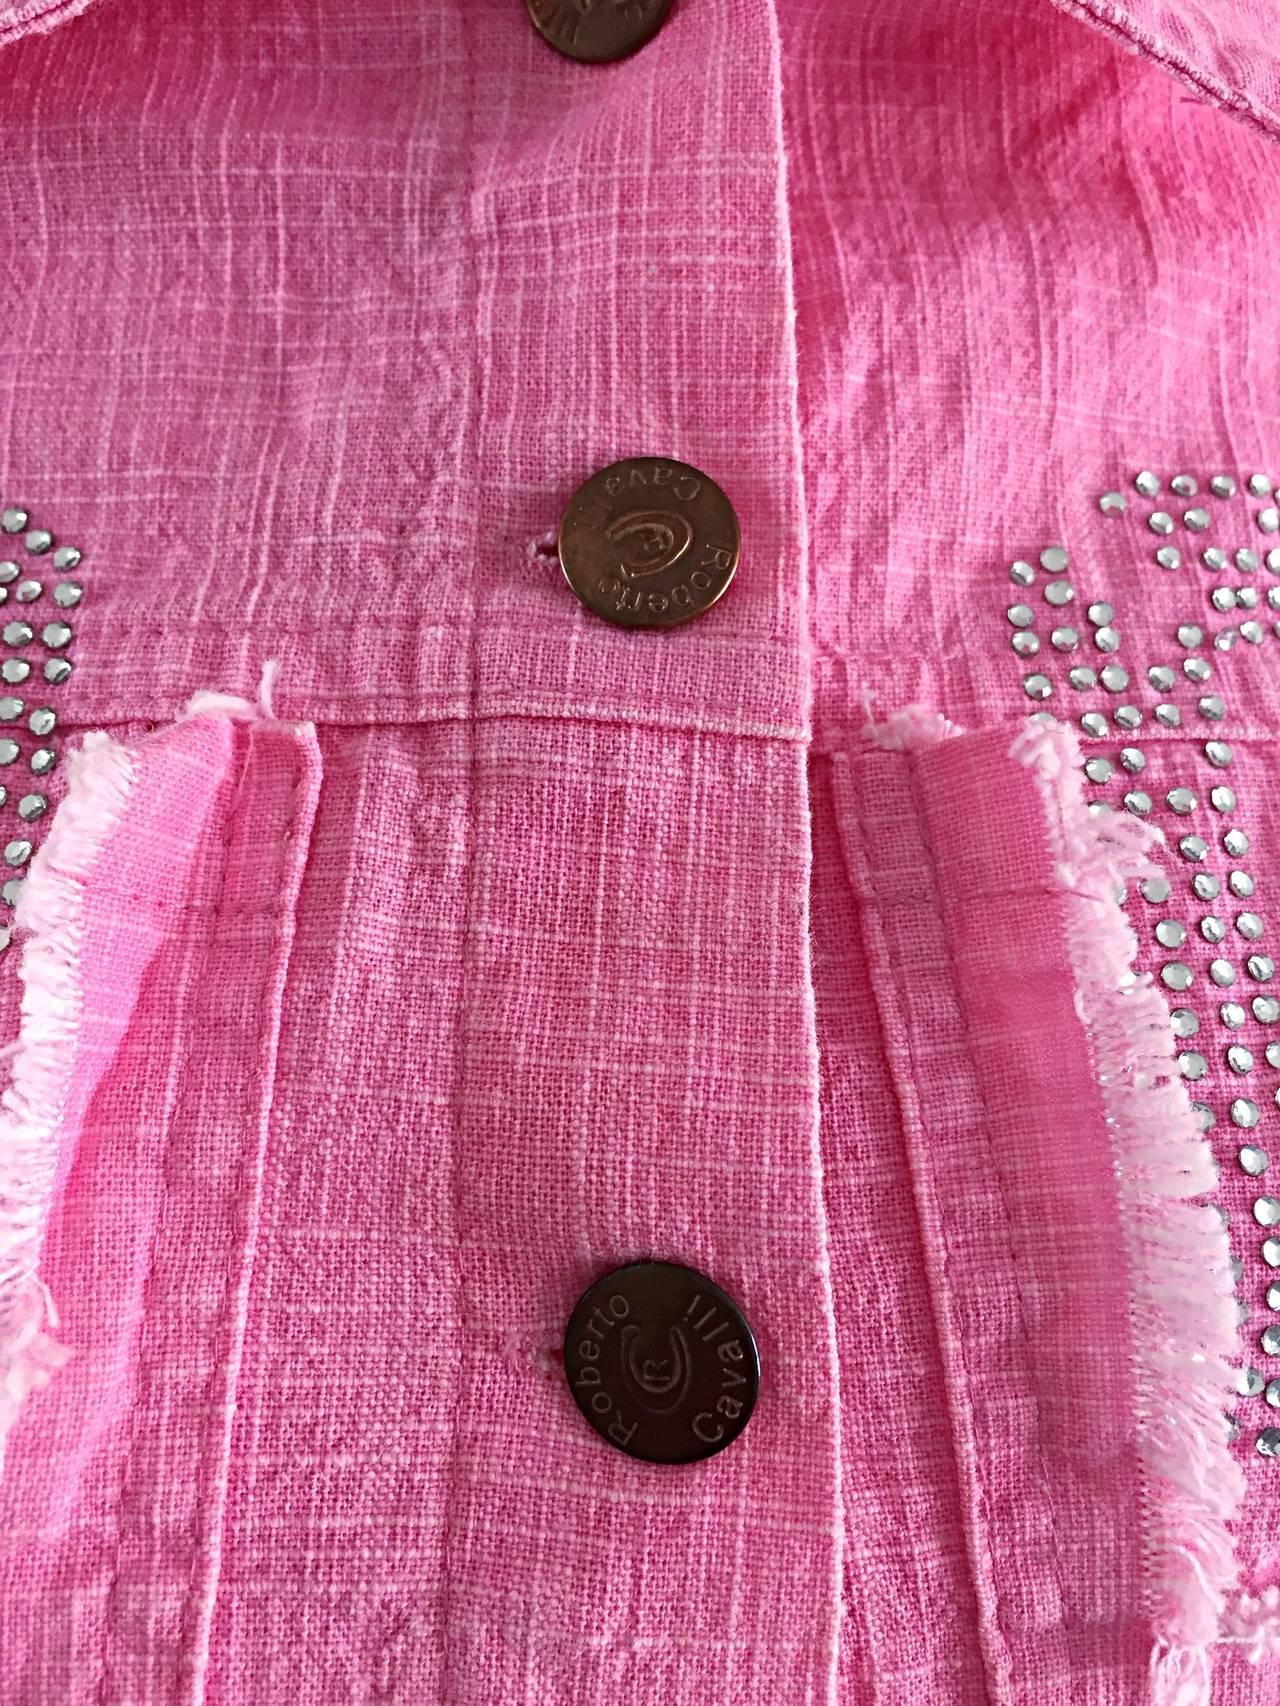 1990s Vintage Roberto Cavalli Pink Denim Jean Jacket + ' R C ' Rhinestones 8